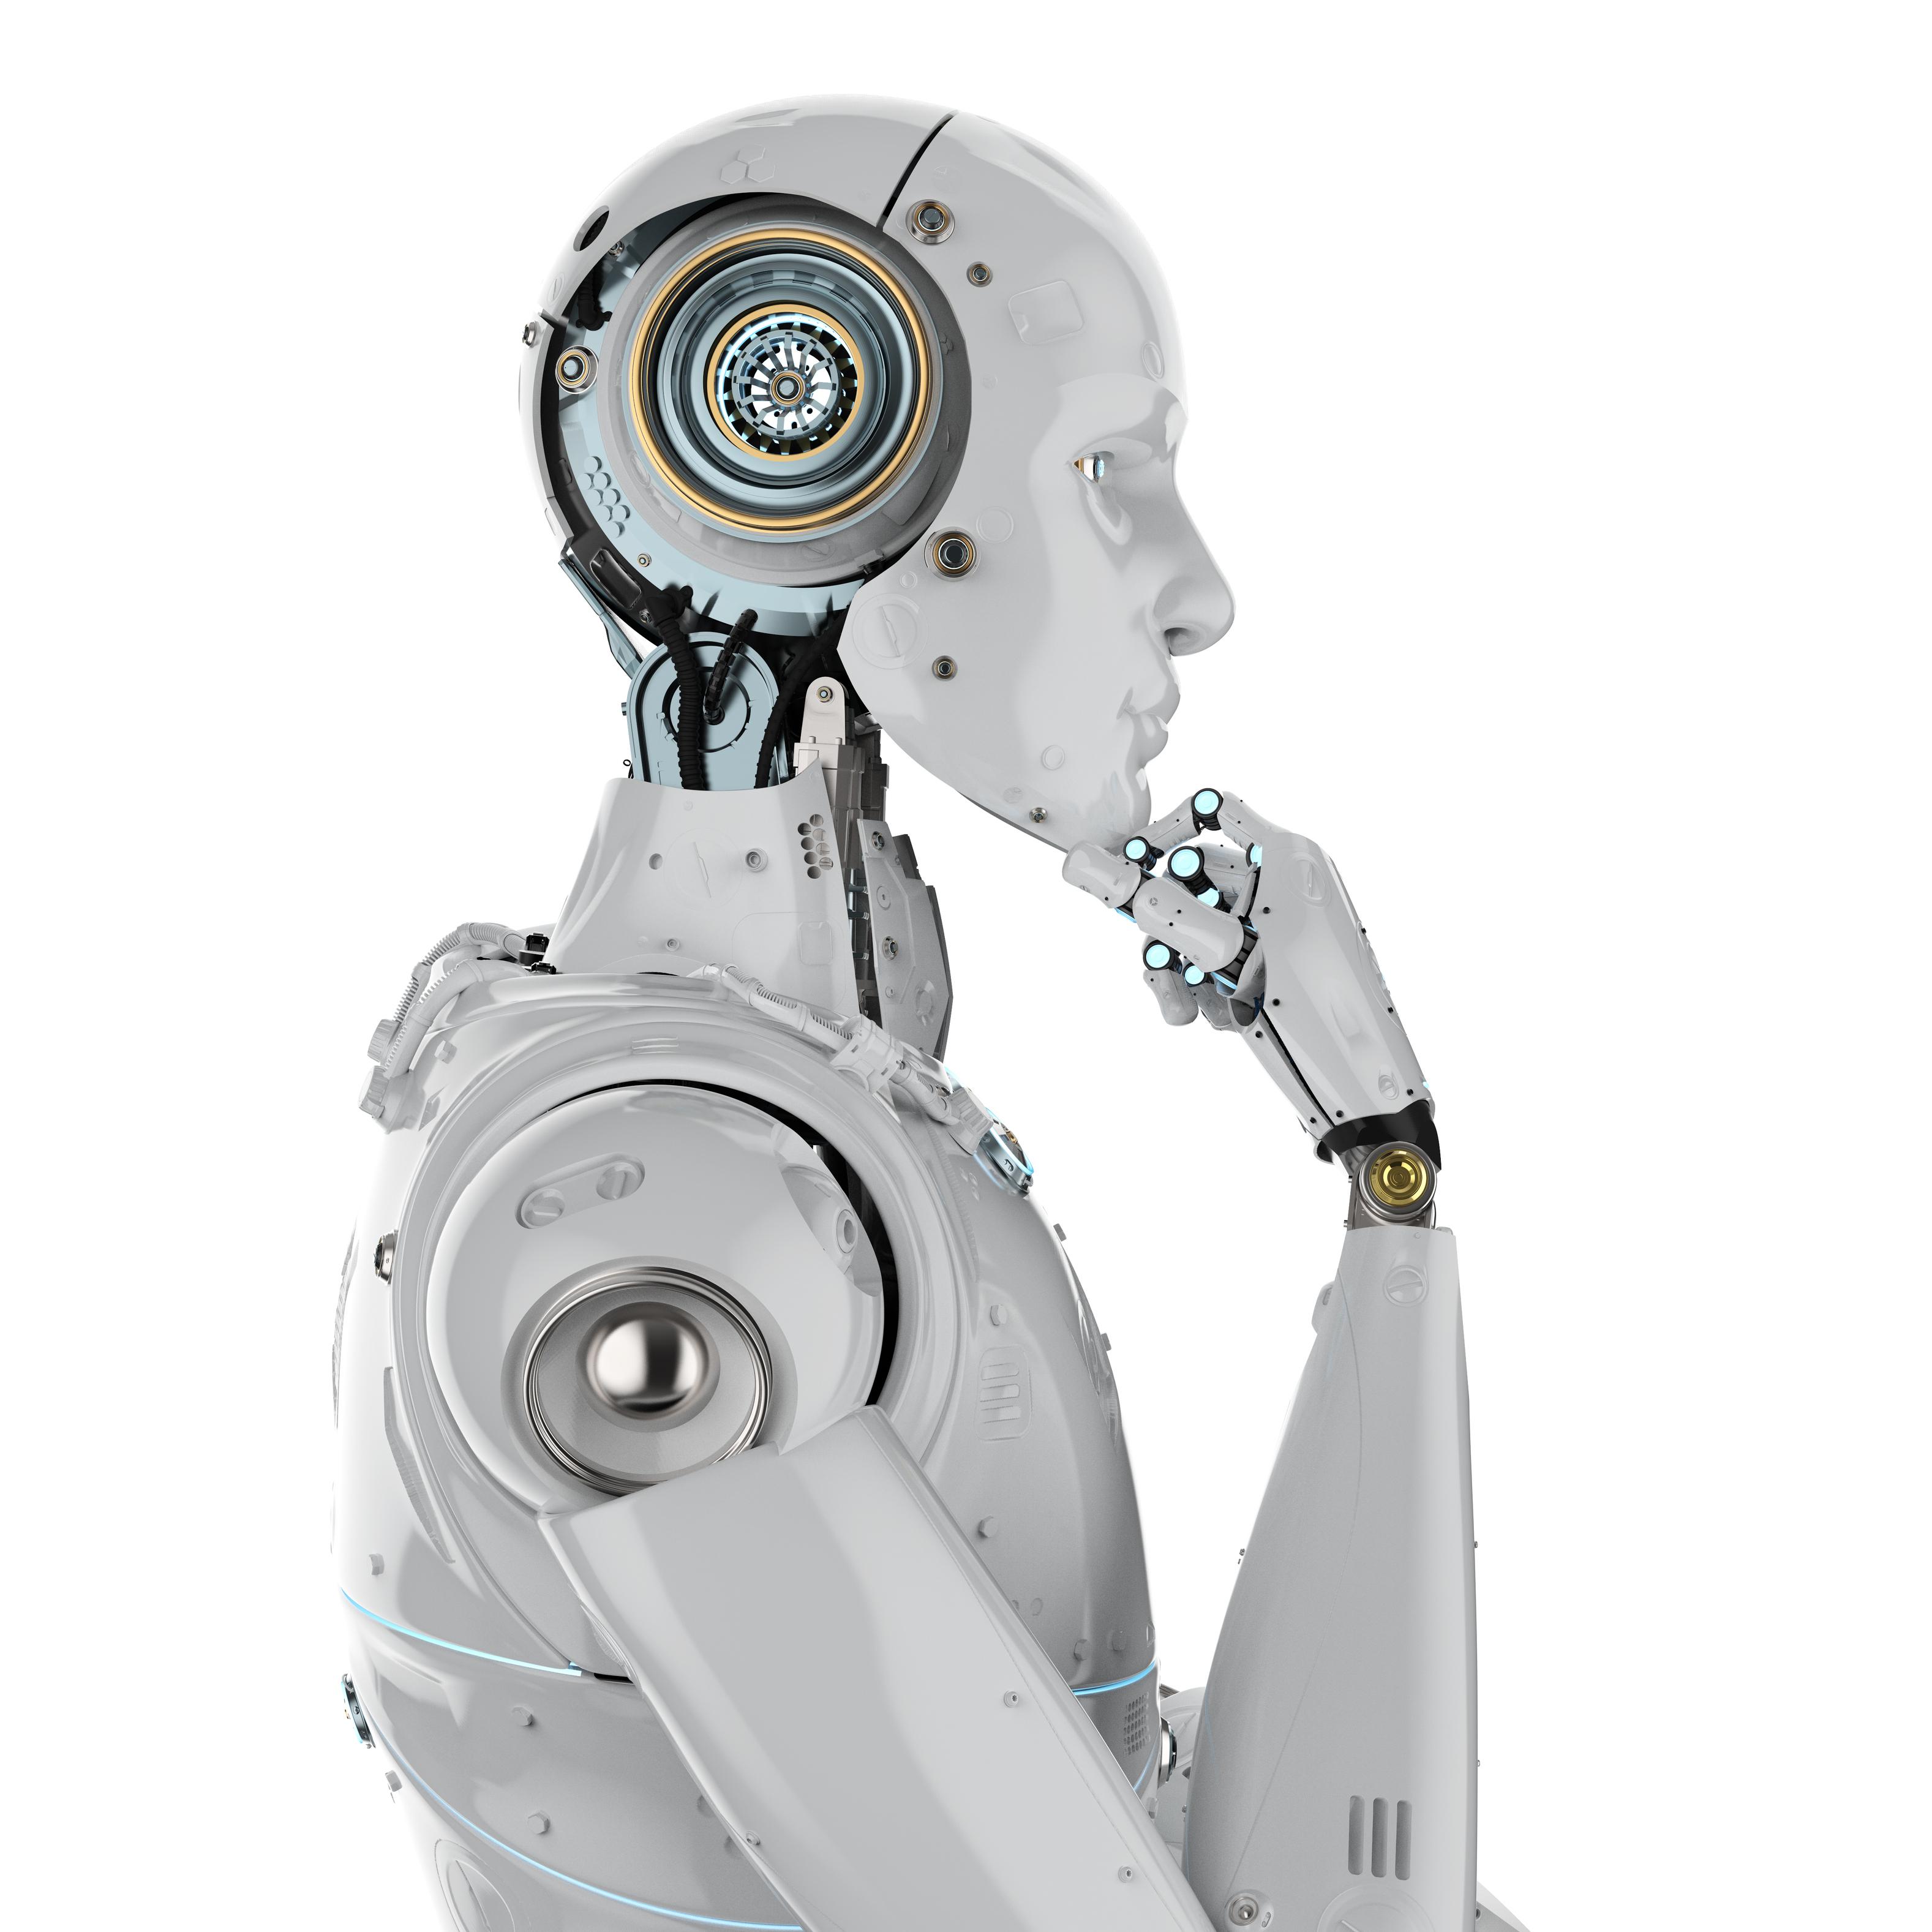 White robot thinking